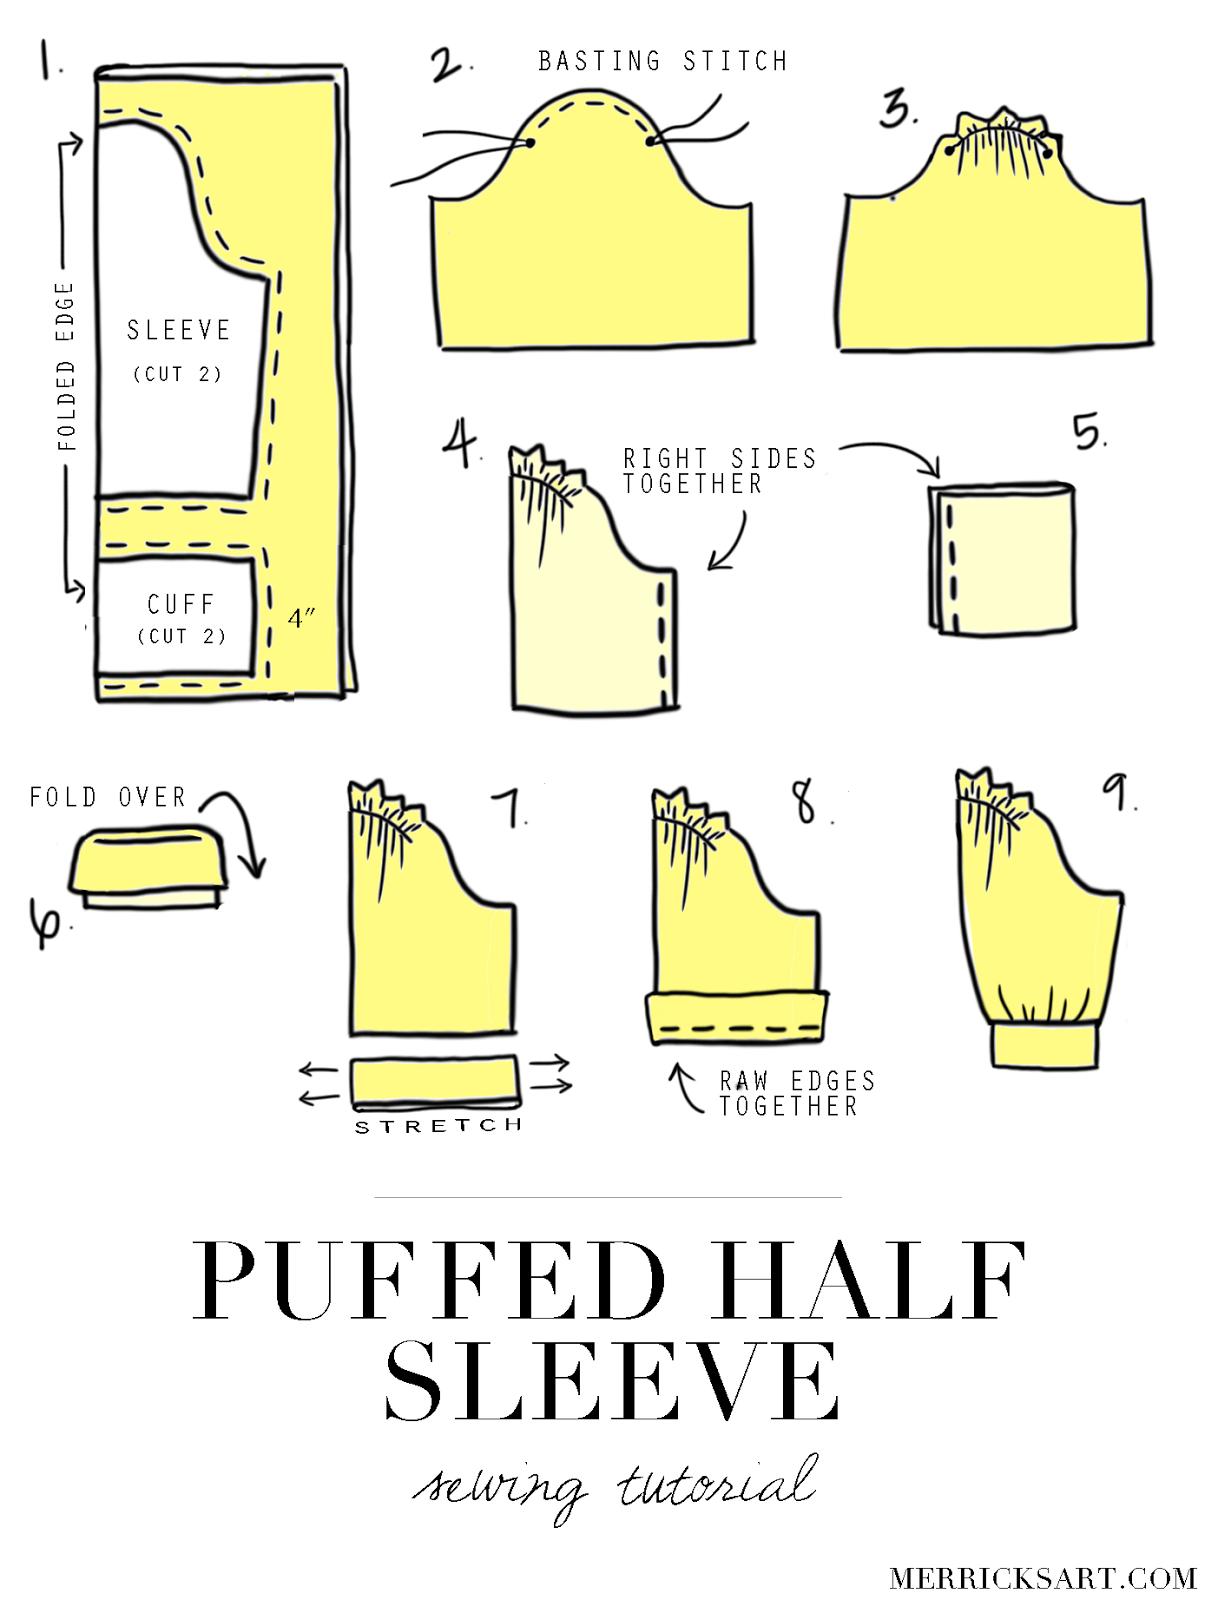 DIY FRIDAY: PUFFED HALF SLEEVE TUTORIAL | sewing n patterns ...